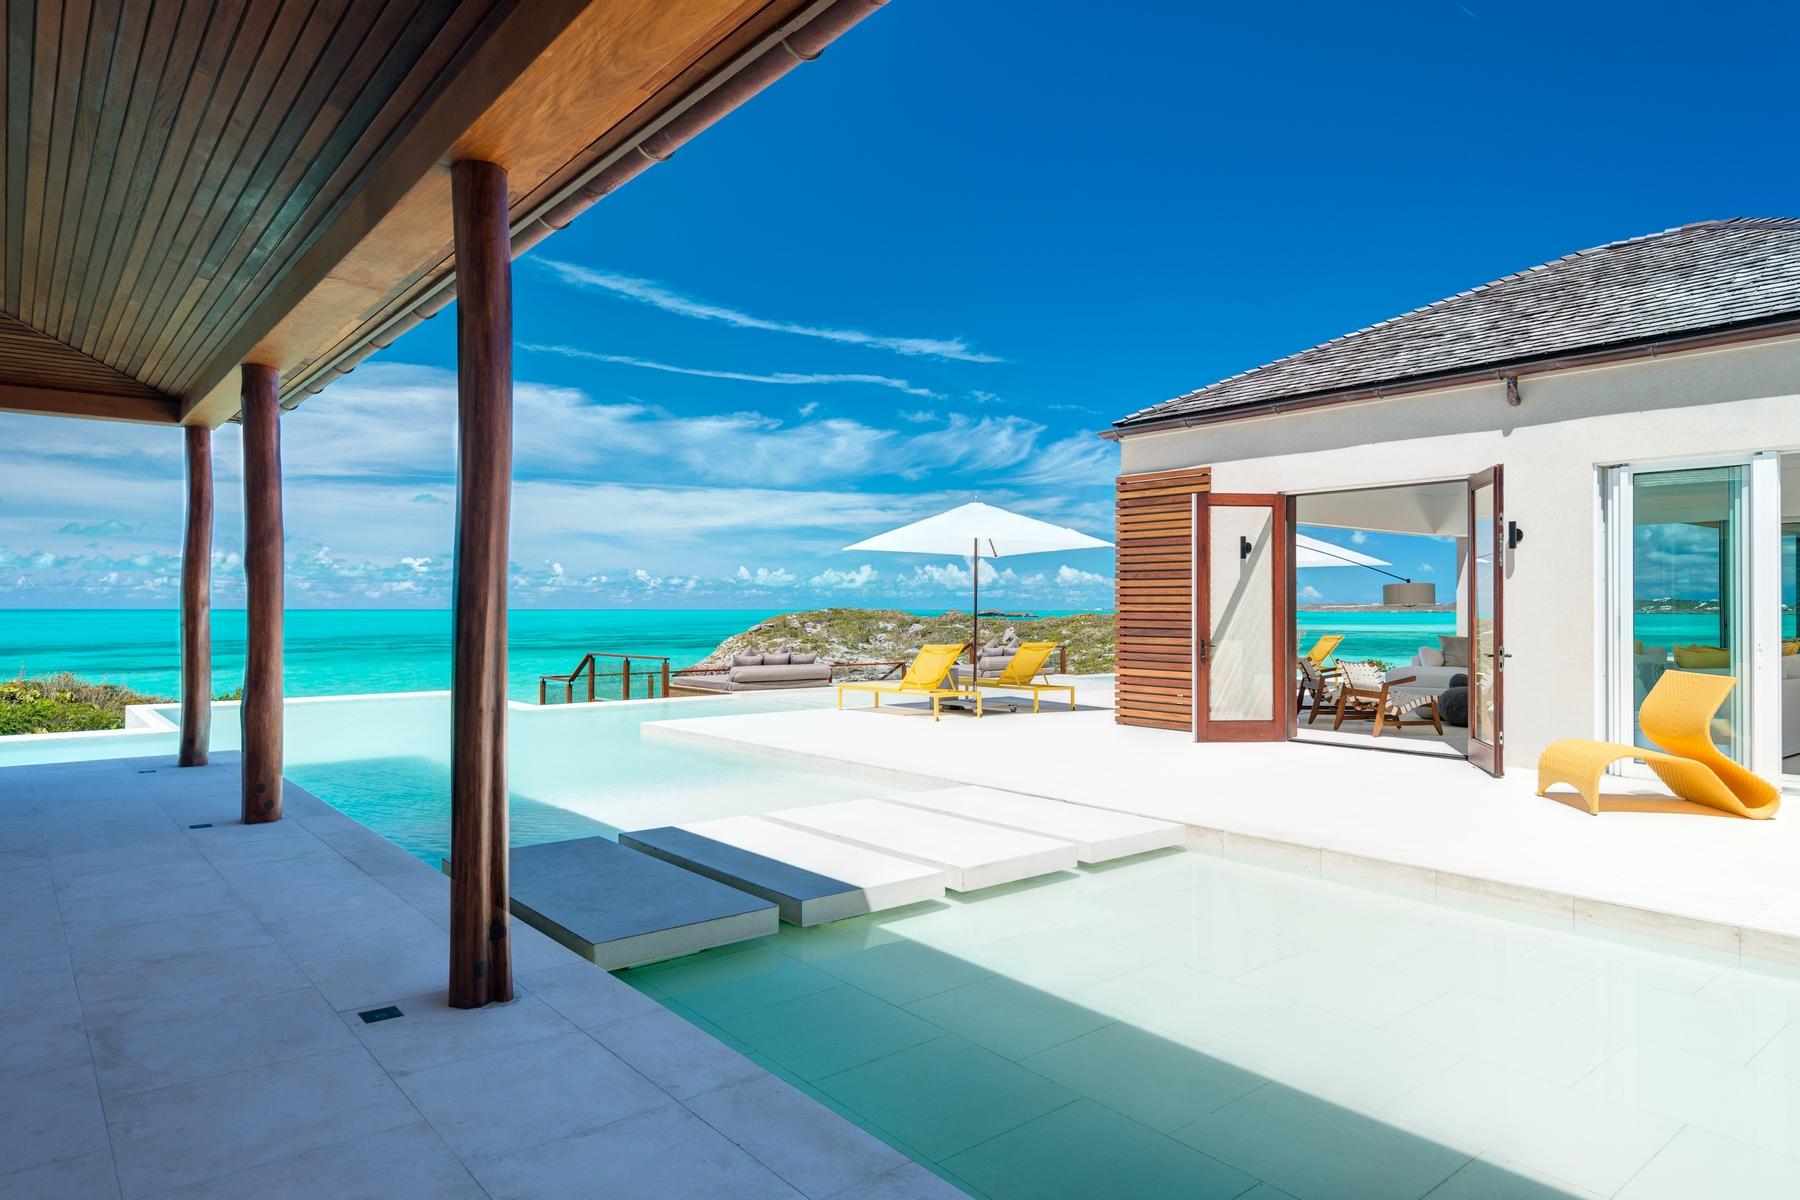 Additional photo for property listing at Turtle Tail Estate Beachfront Turtle Tail, 普罗维登夏 TCI 特克斯和凯科斯群岛